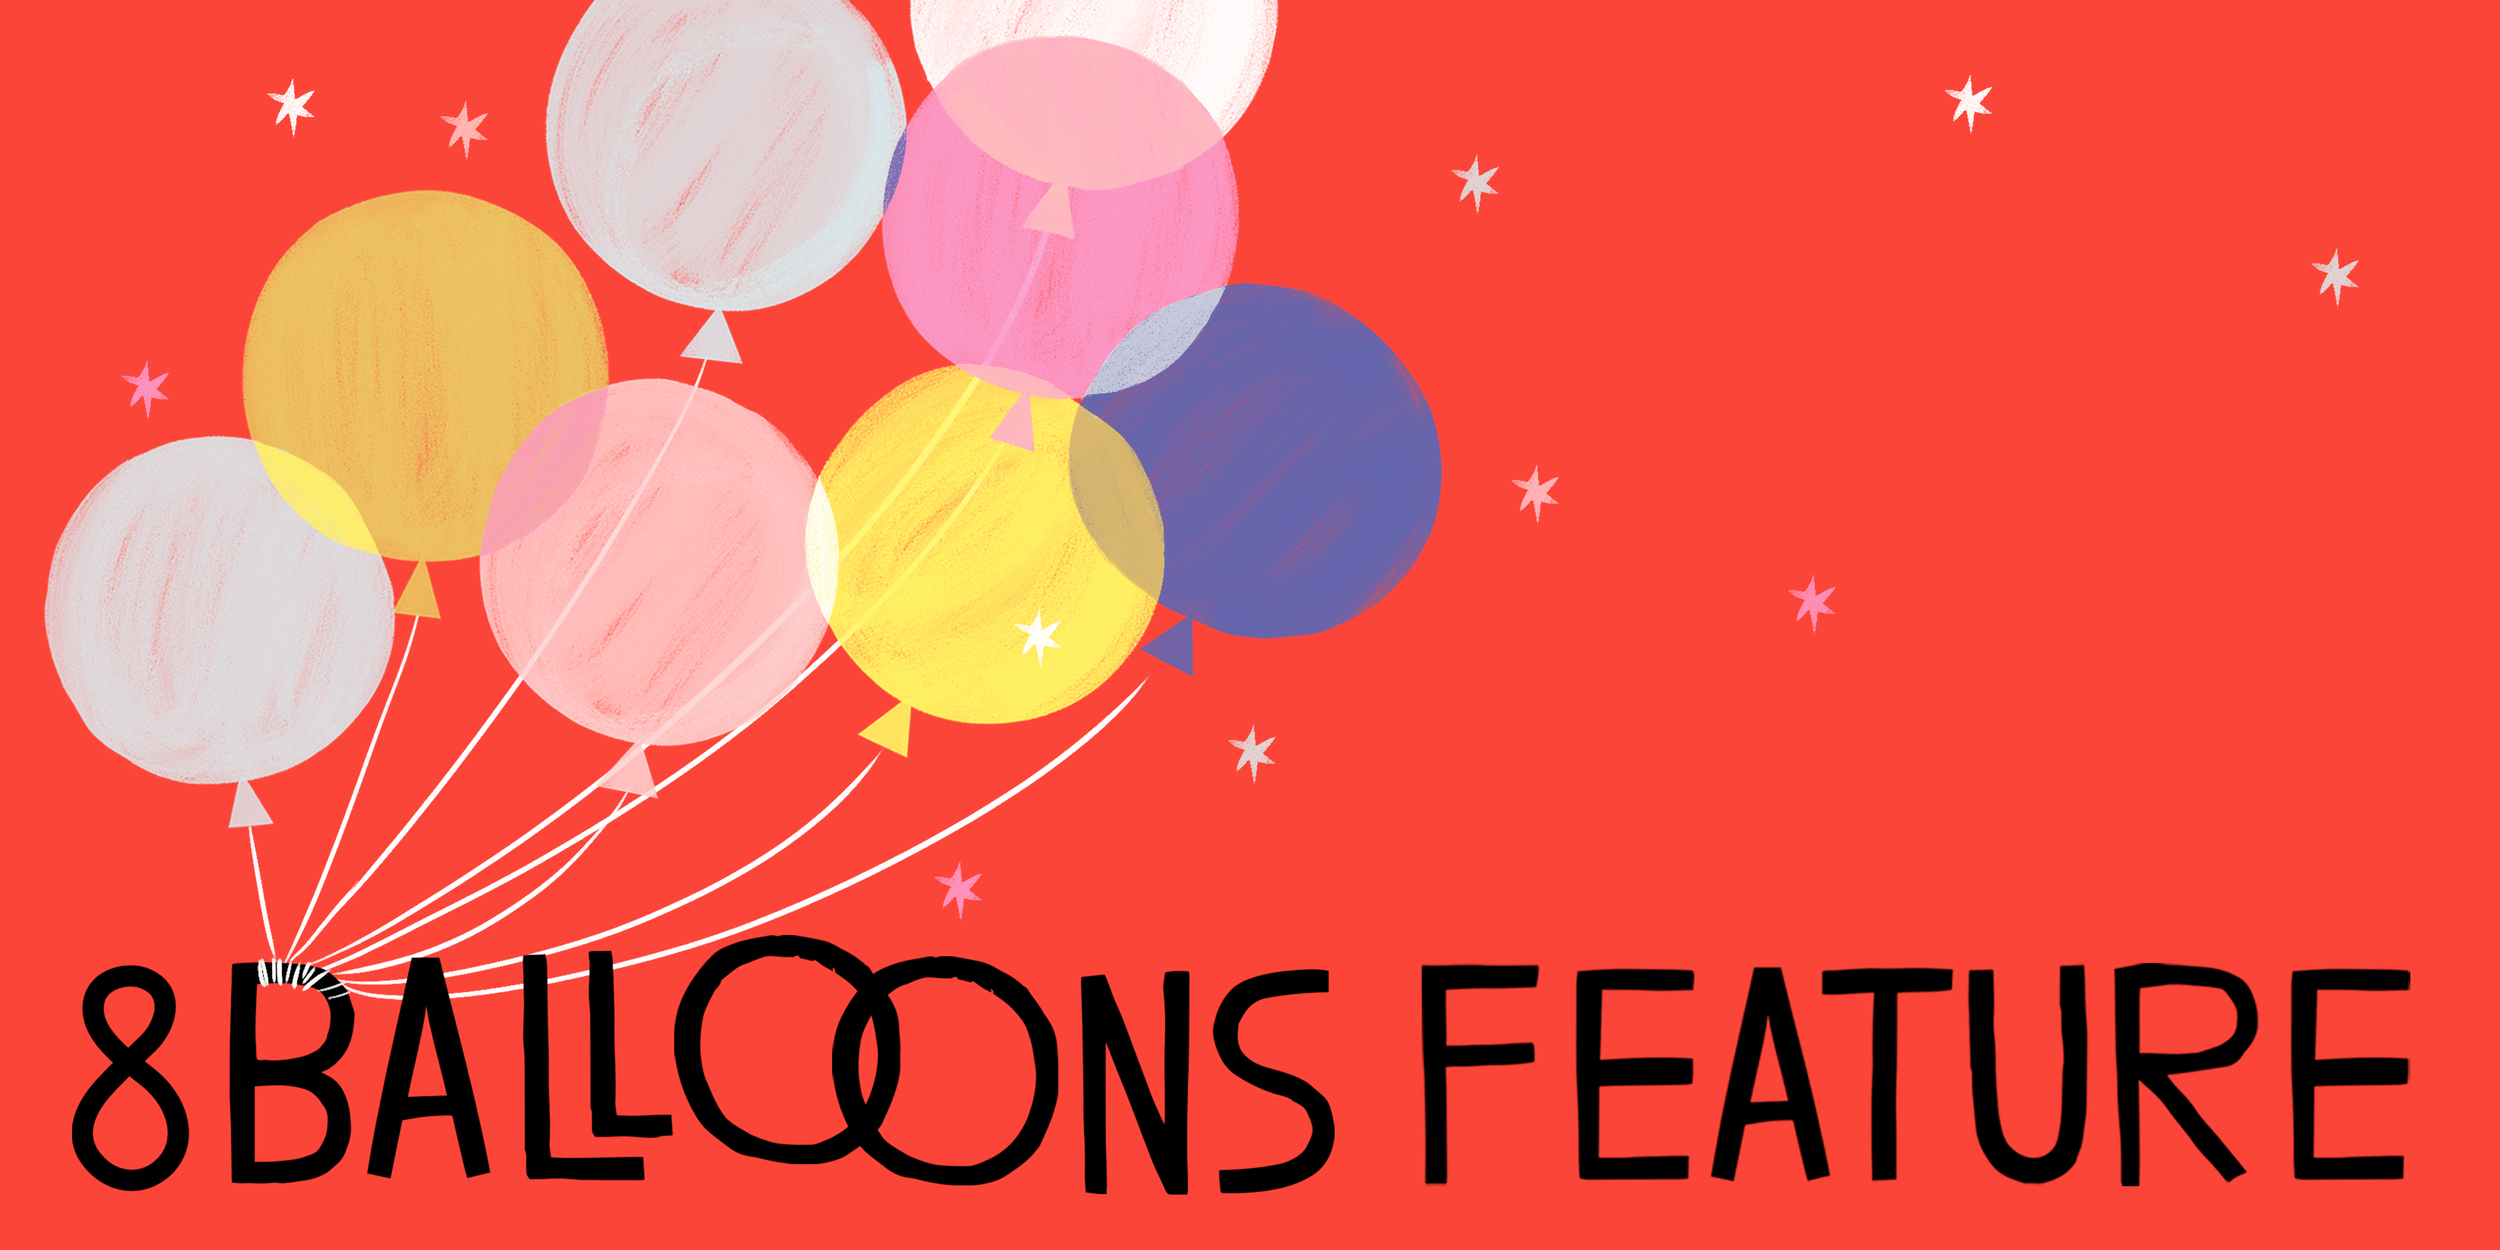 8 Balloons Featuring Hip-Hip